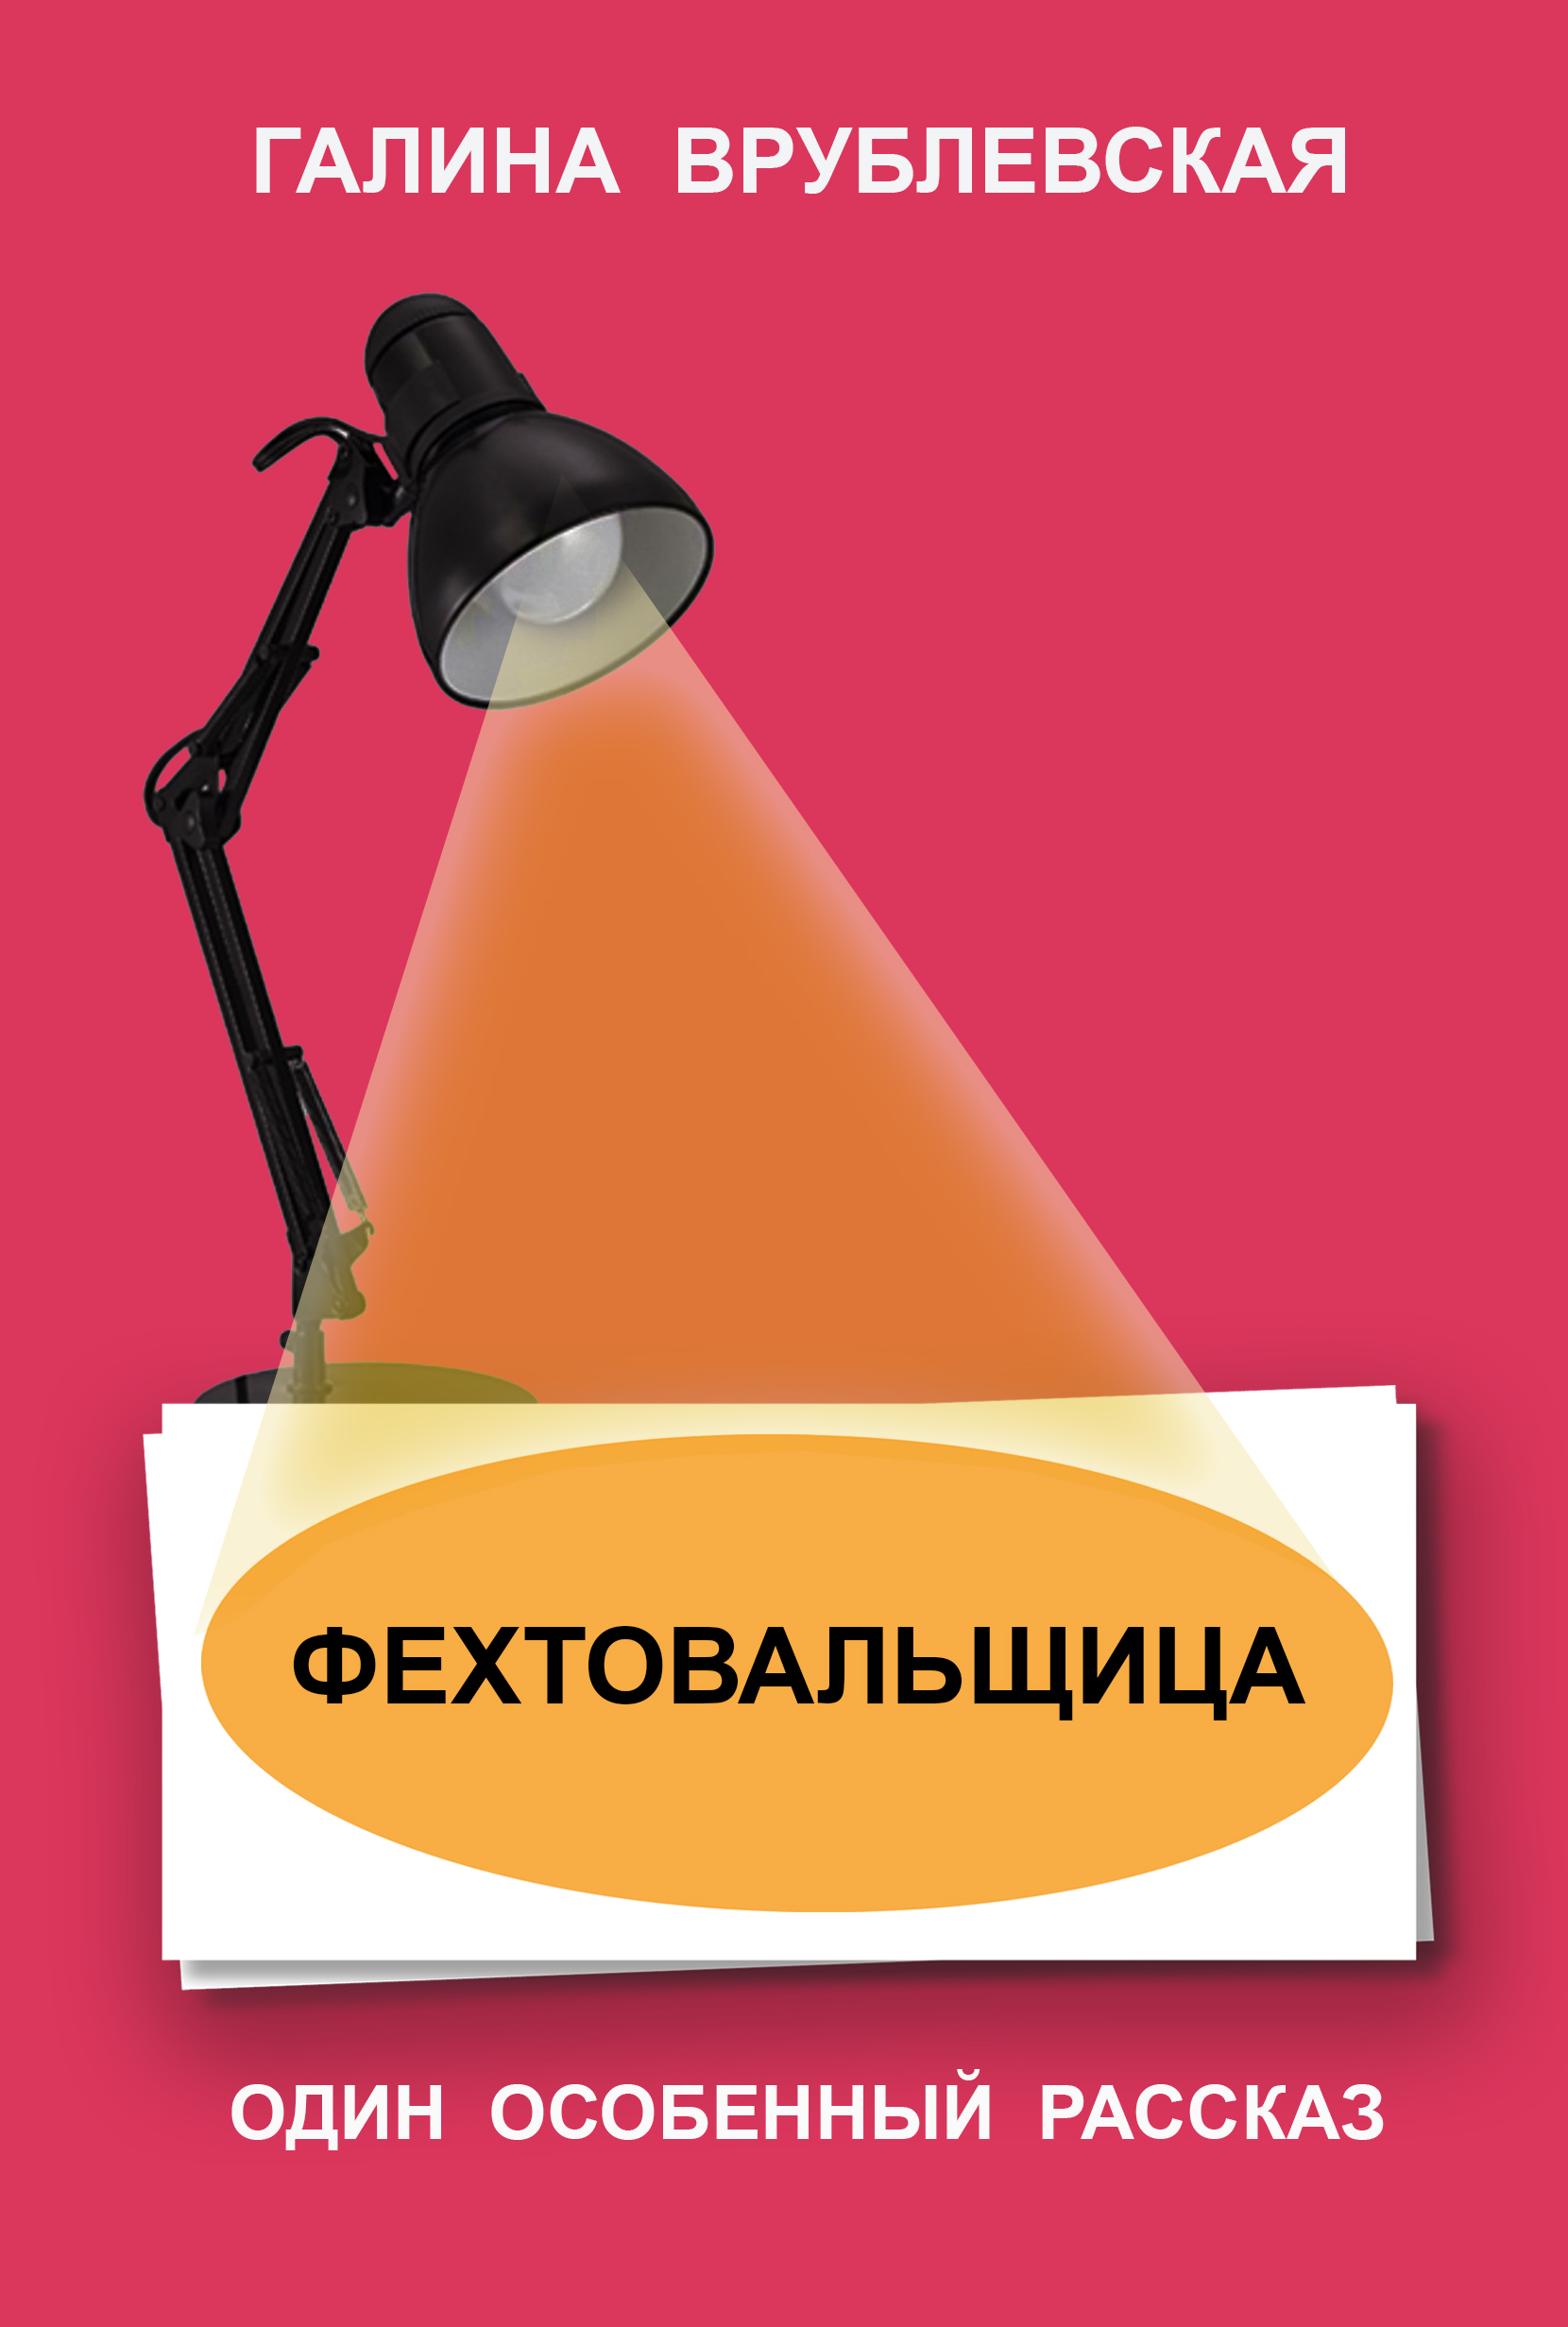 все цены на Галина Врублевская Фехтовальщица онлайн